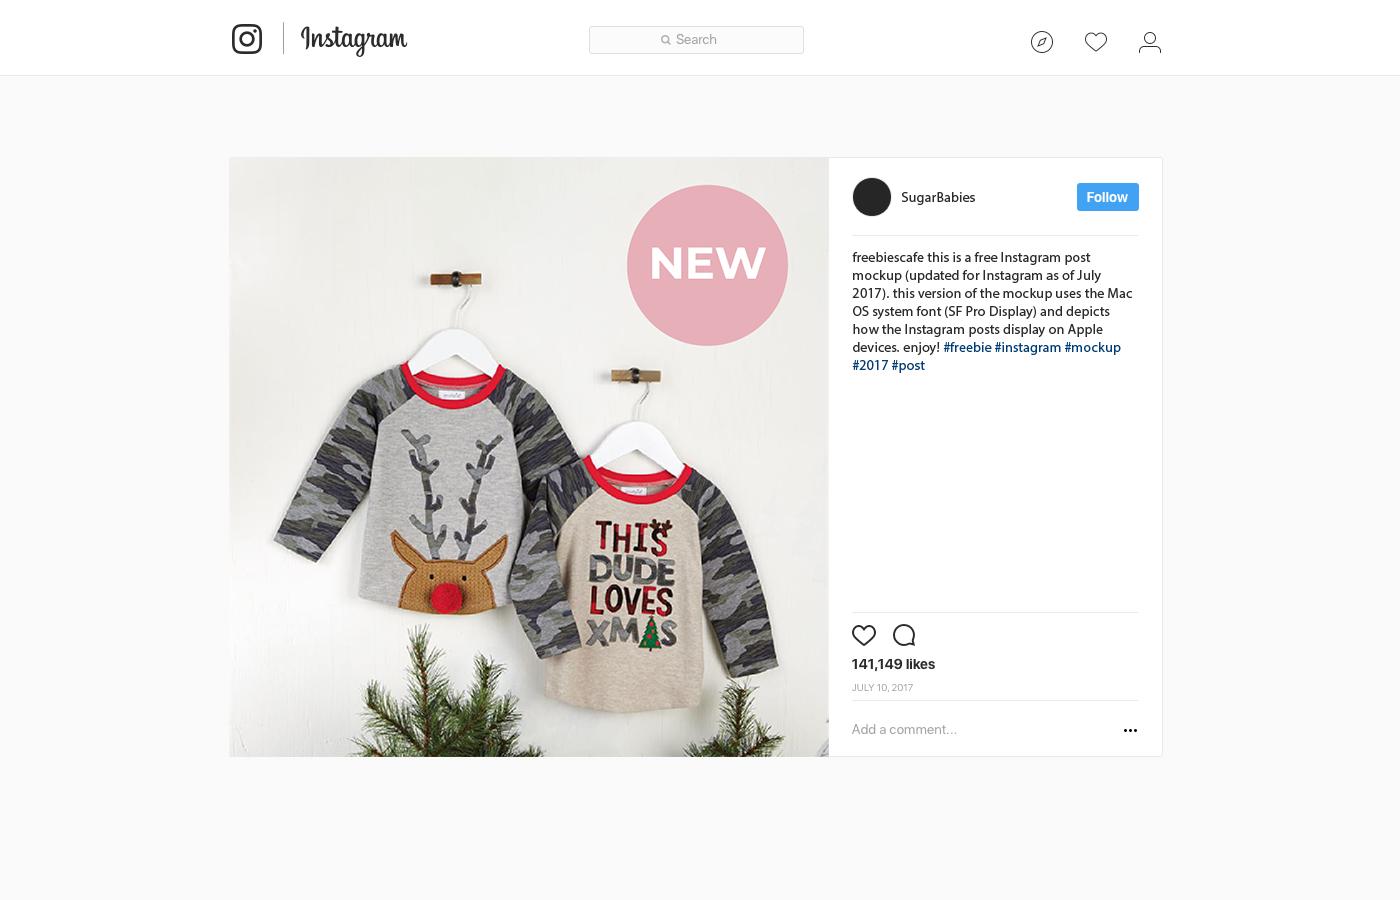 Instagram post ads